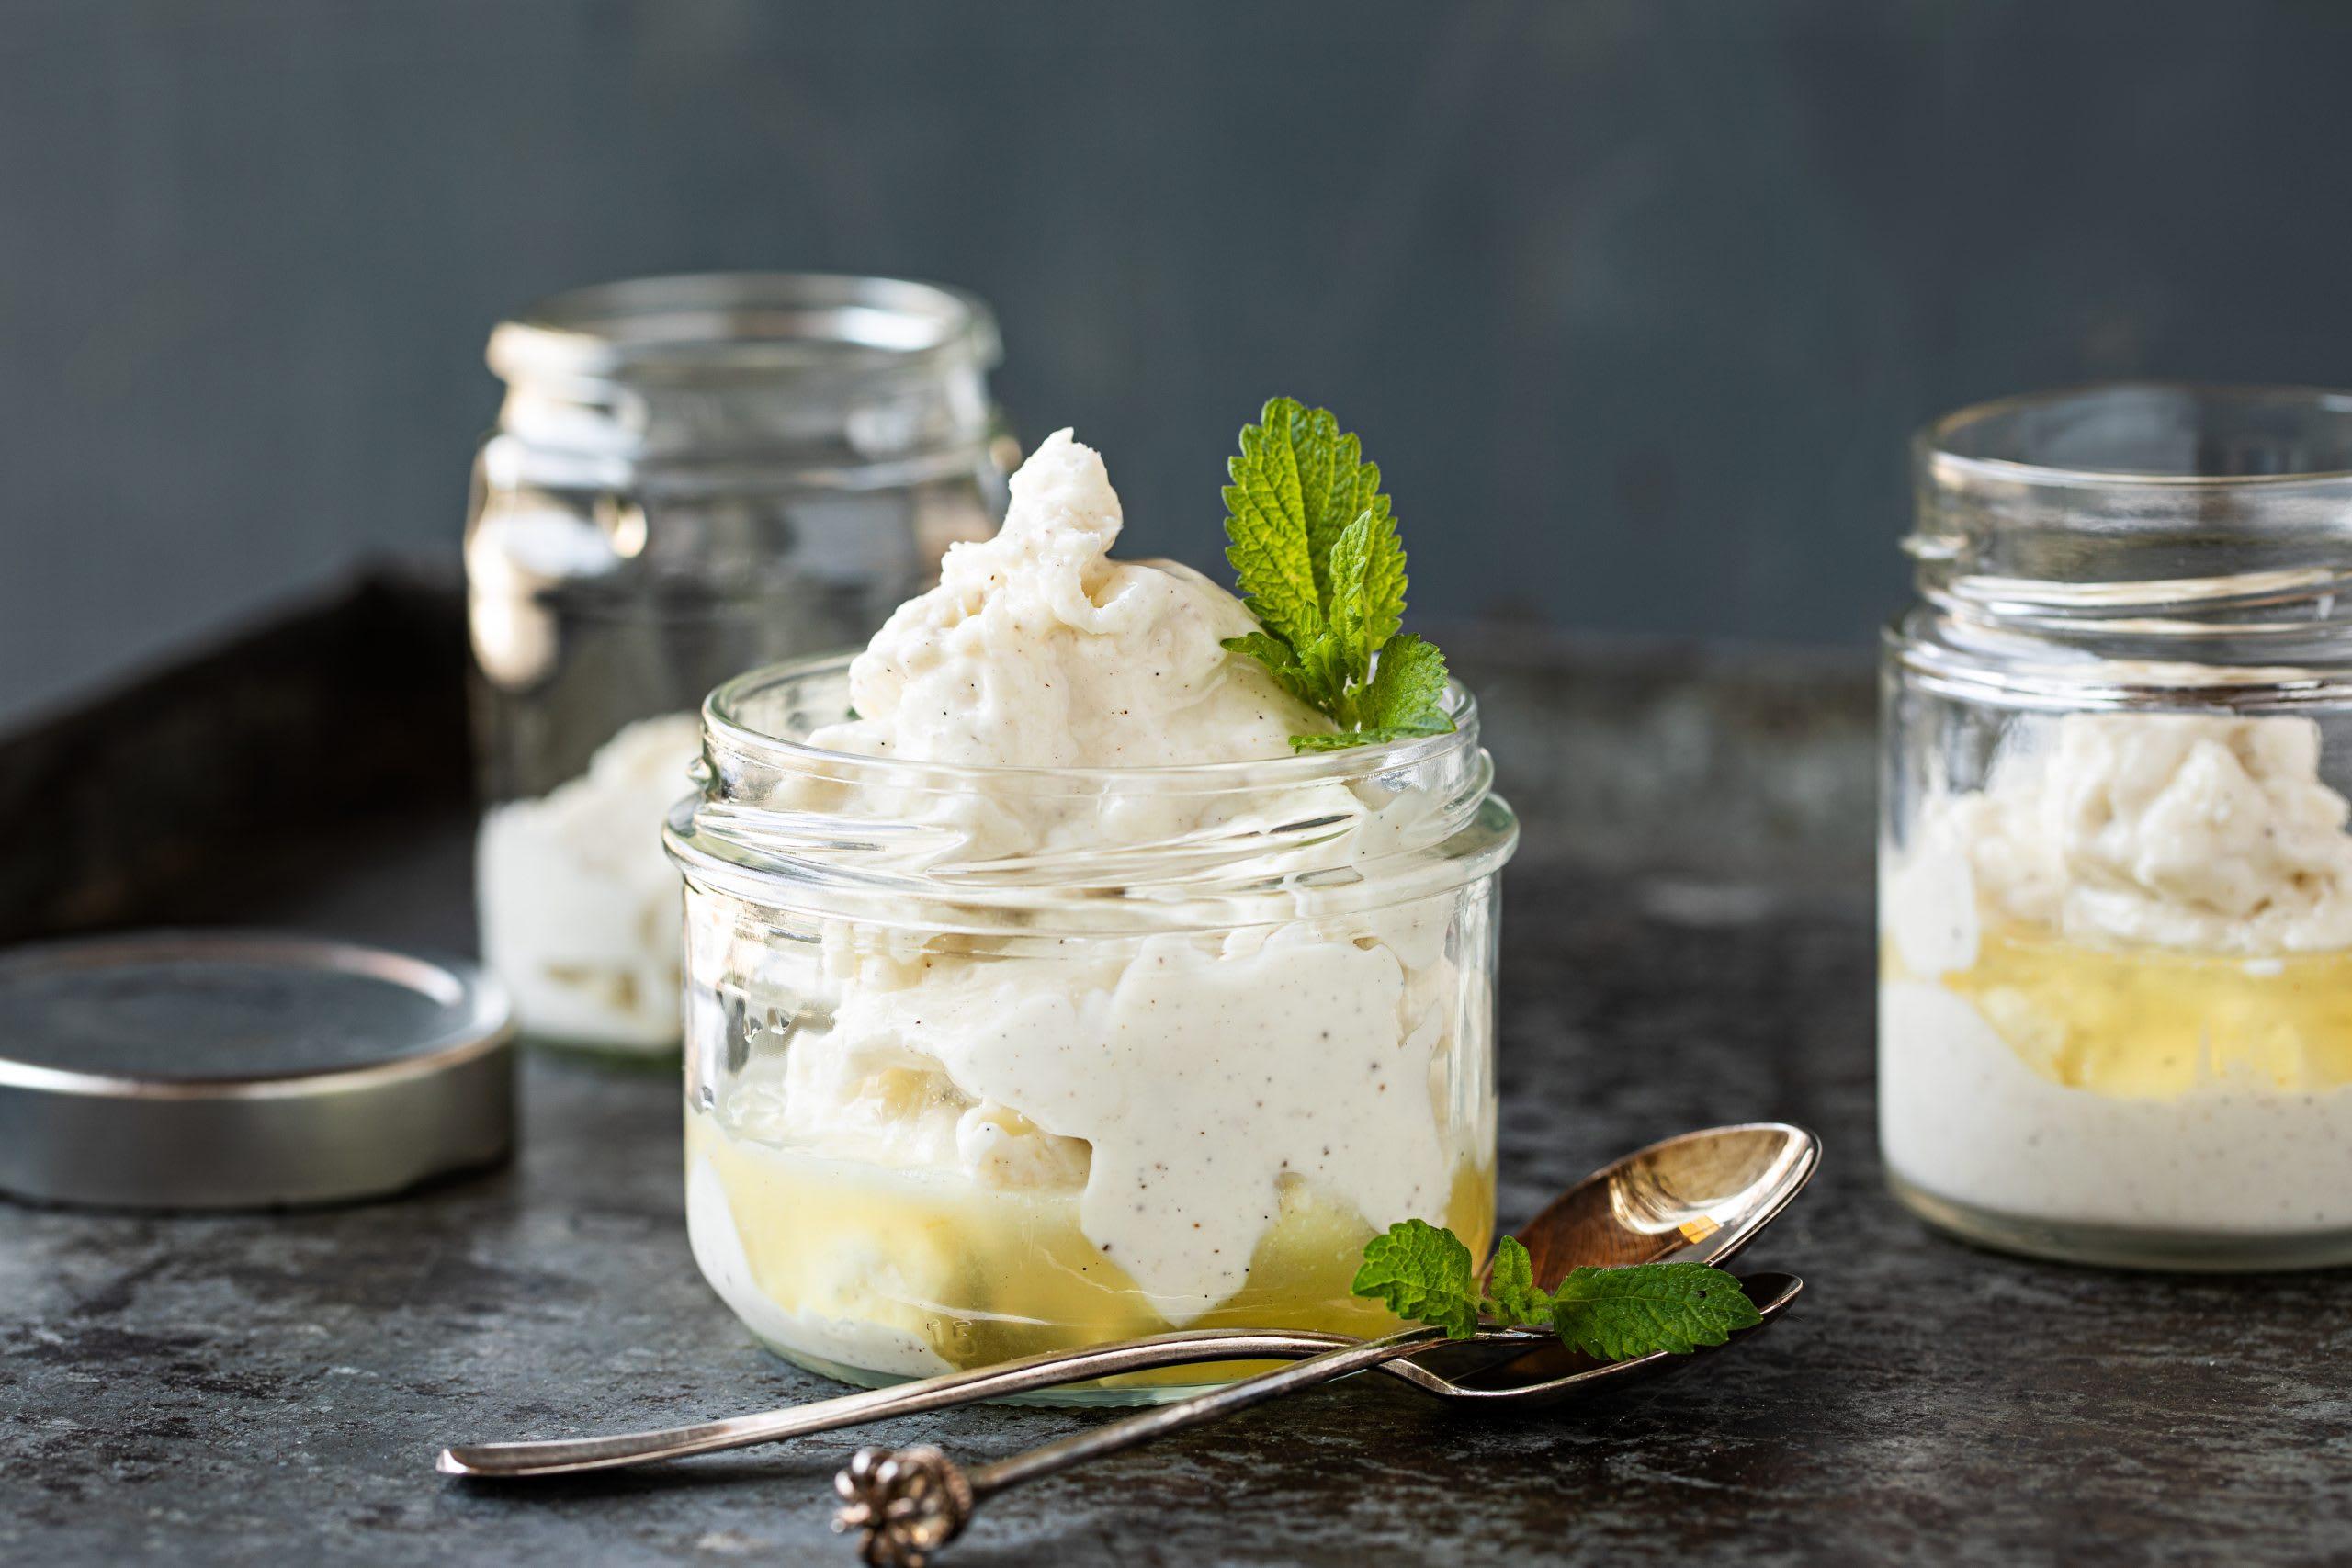 Vanille-Frozen-Yogurt mit Holunderblütensirup